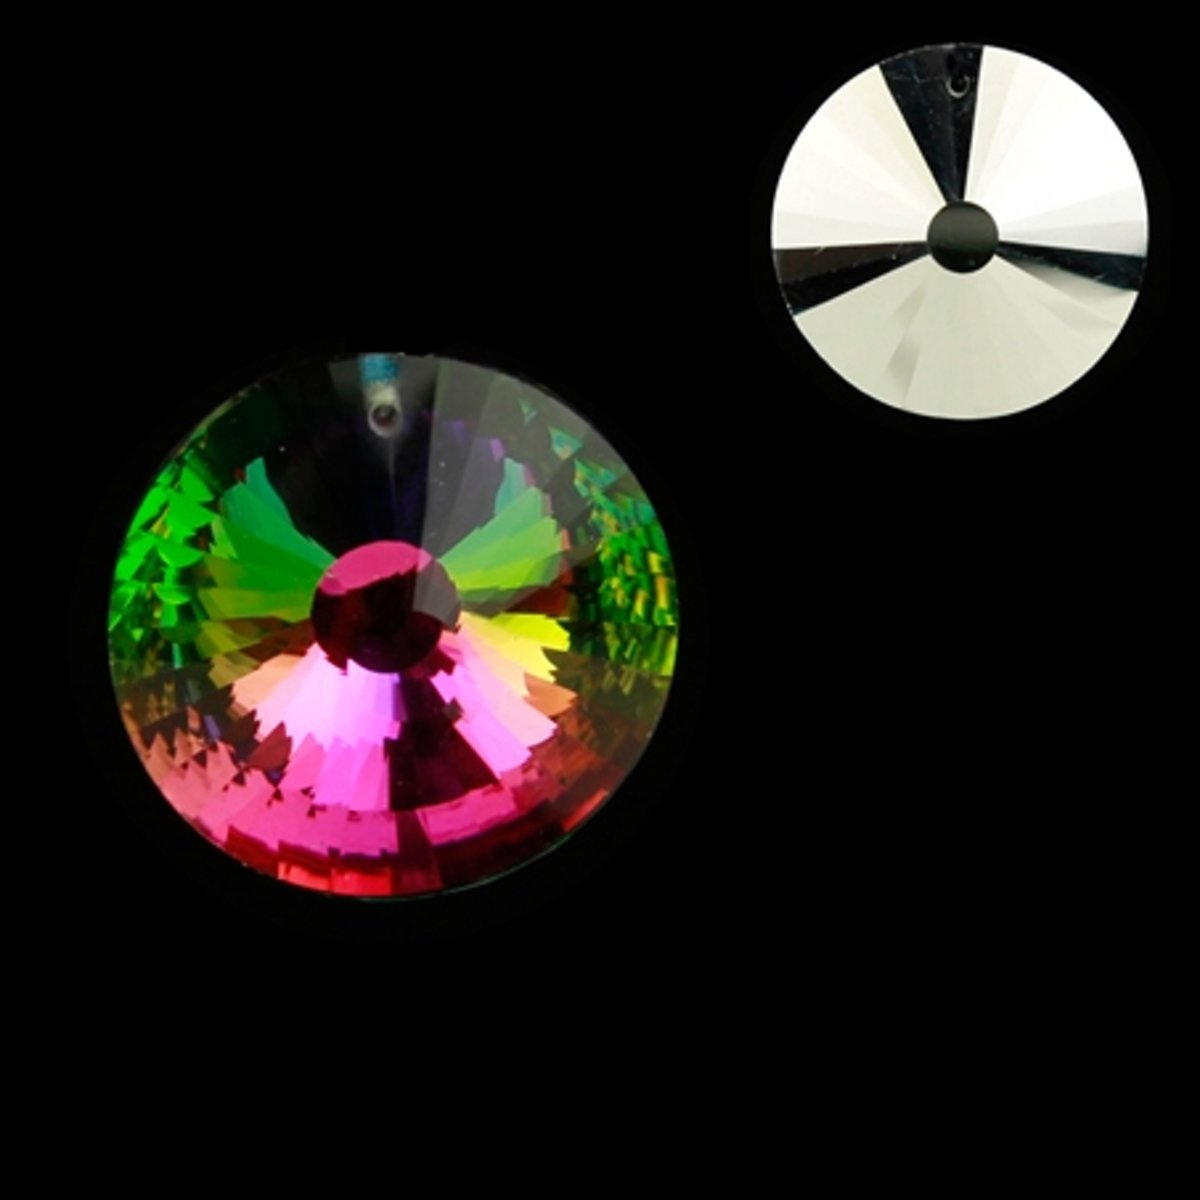 Regenboogkristal cirkel multicolor AAA kwaliteit kopen